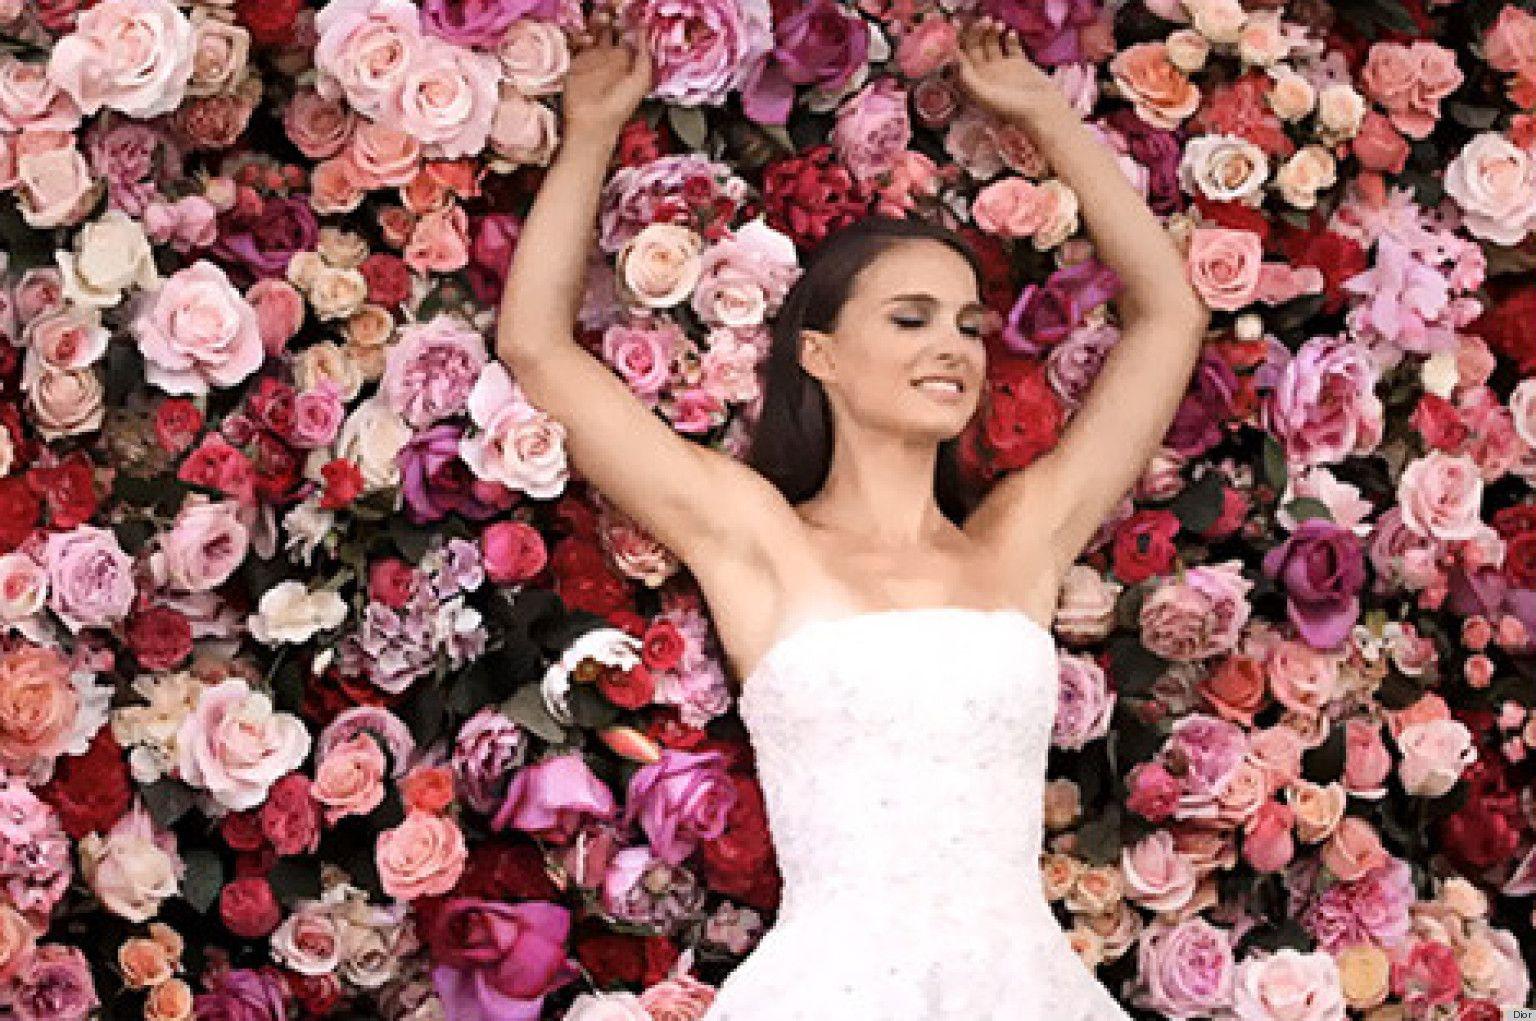 Vintage Wedding Dresses Reno: Miss Dior Natalie Portman Commercial